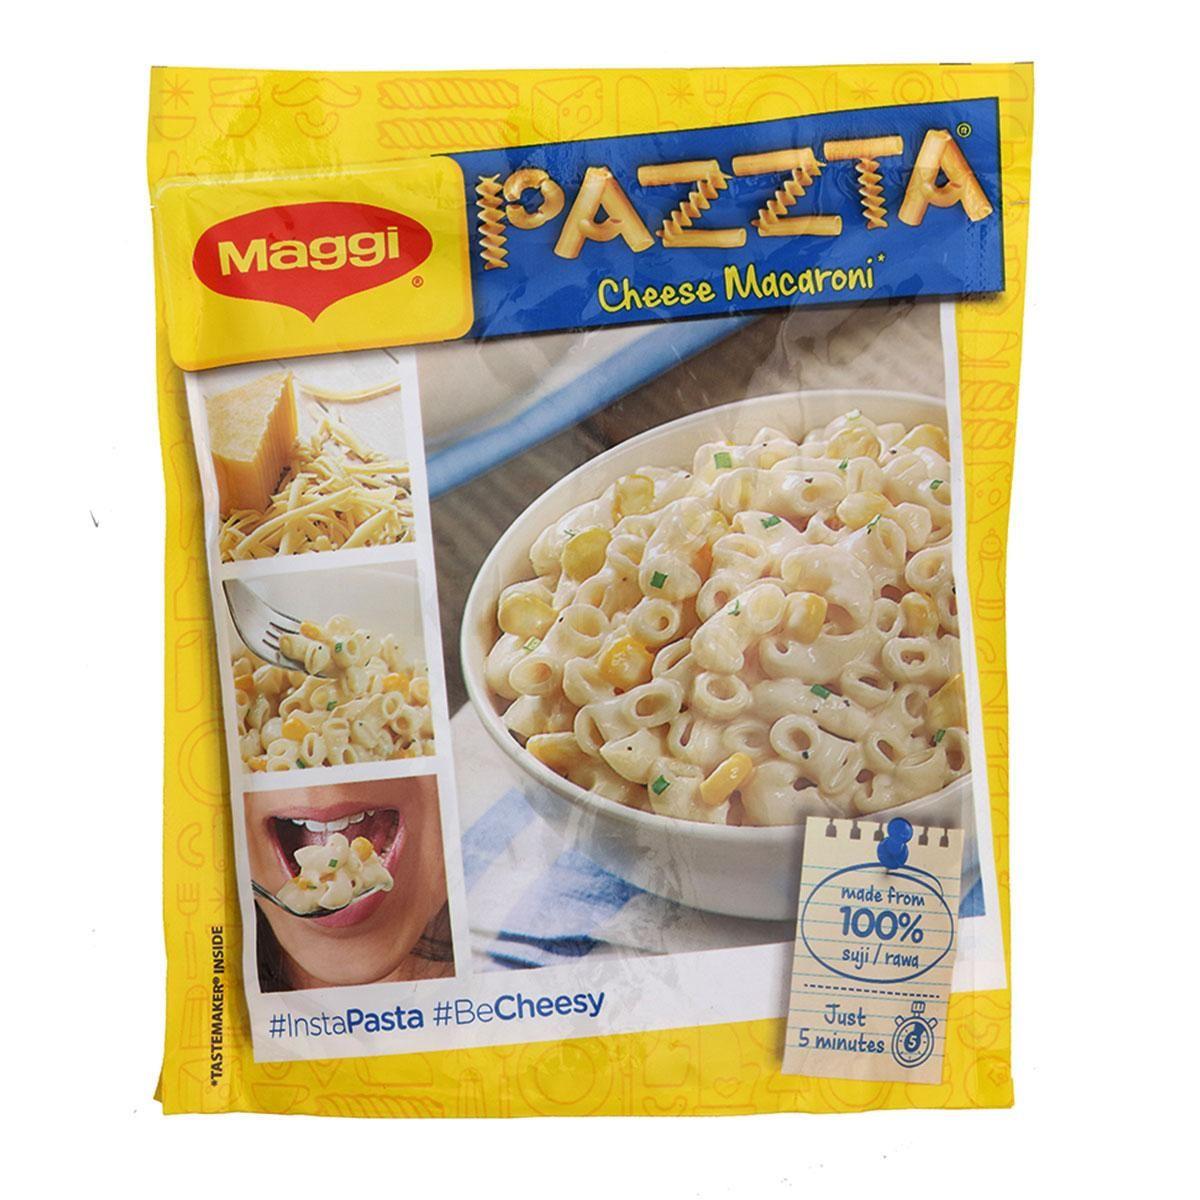 MAGGI PAZZTA Instant Pasta, Cheese Macaroni.